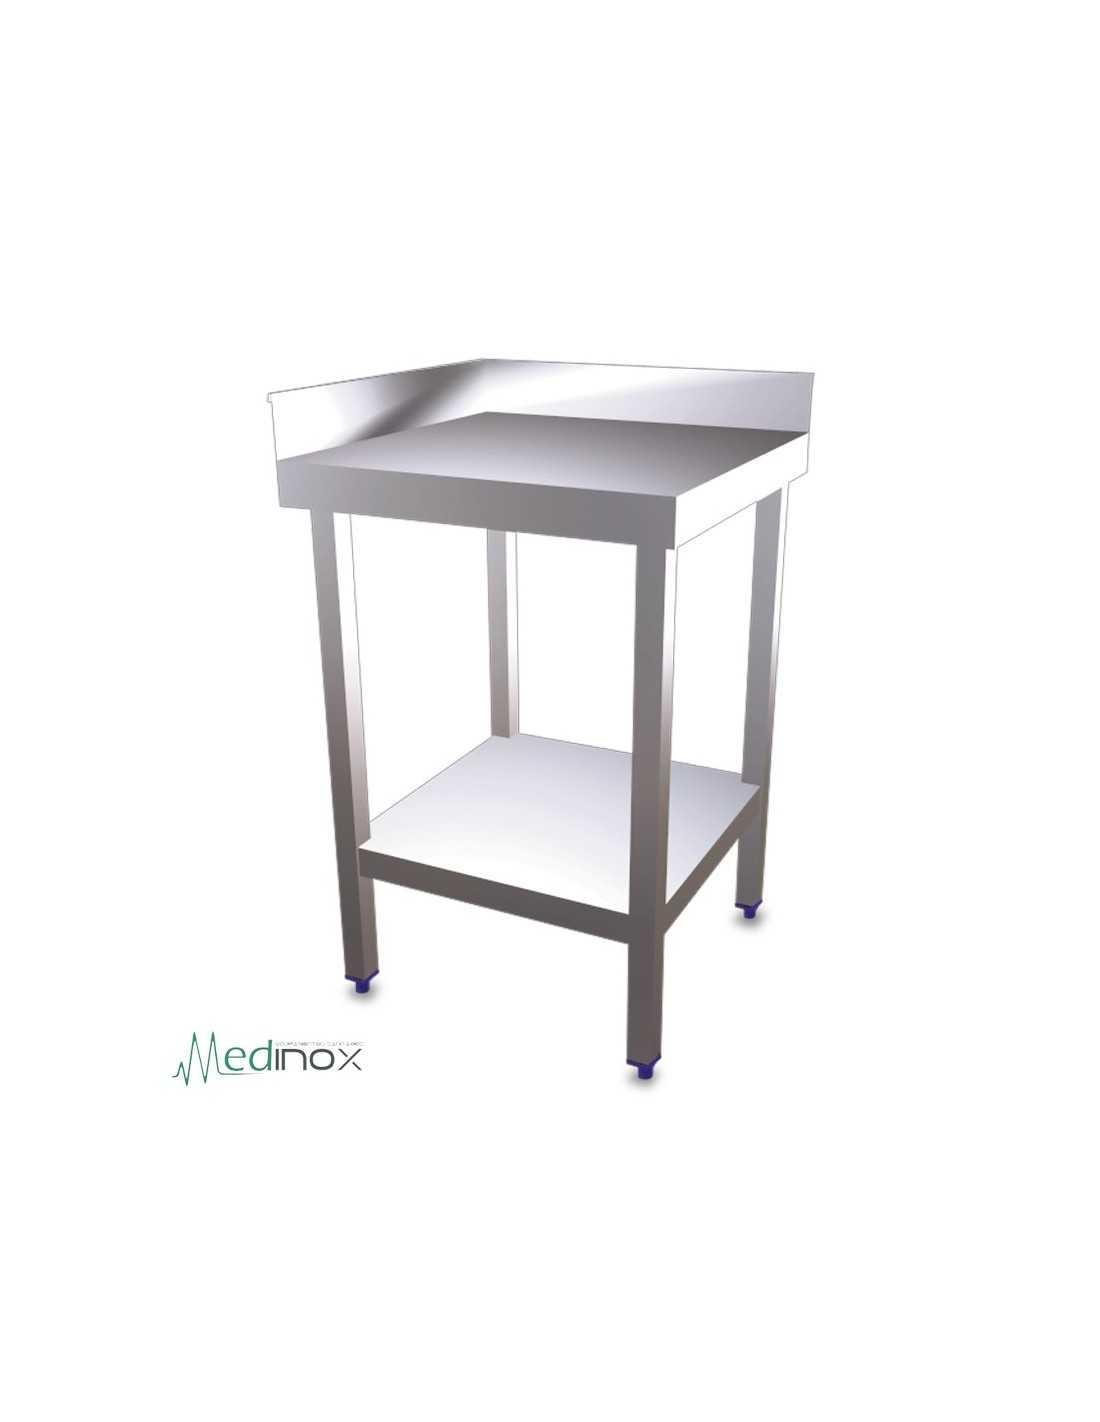 Mesa de esquina con estantente fs074602 mural patas 4x4cm for Mesas para esquinas